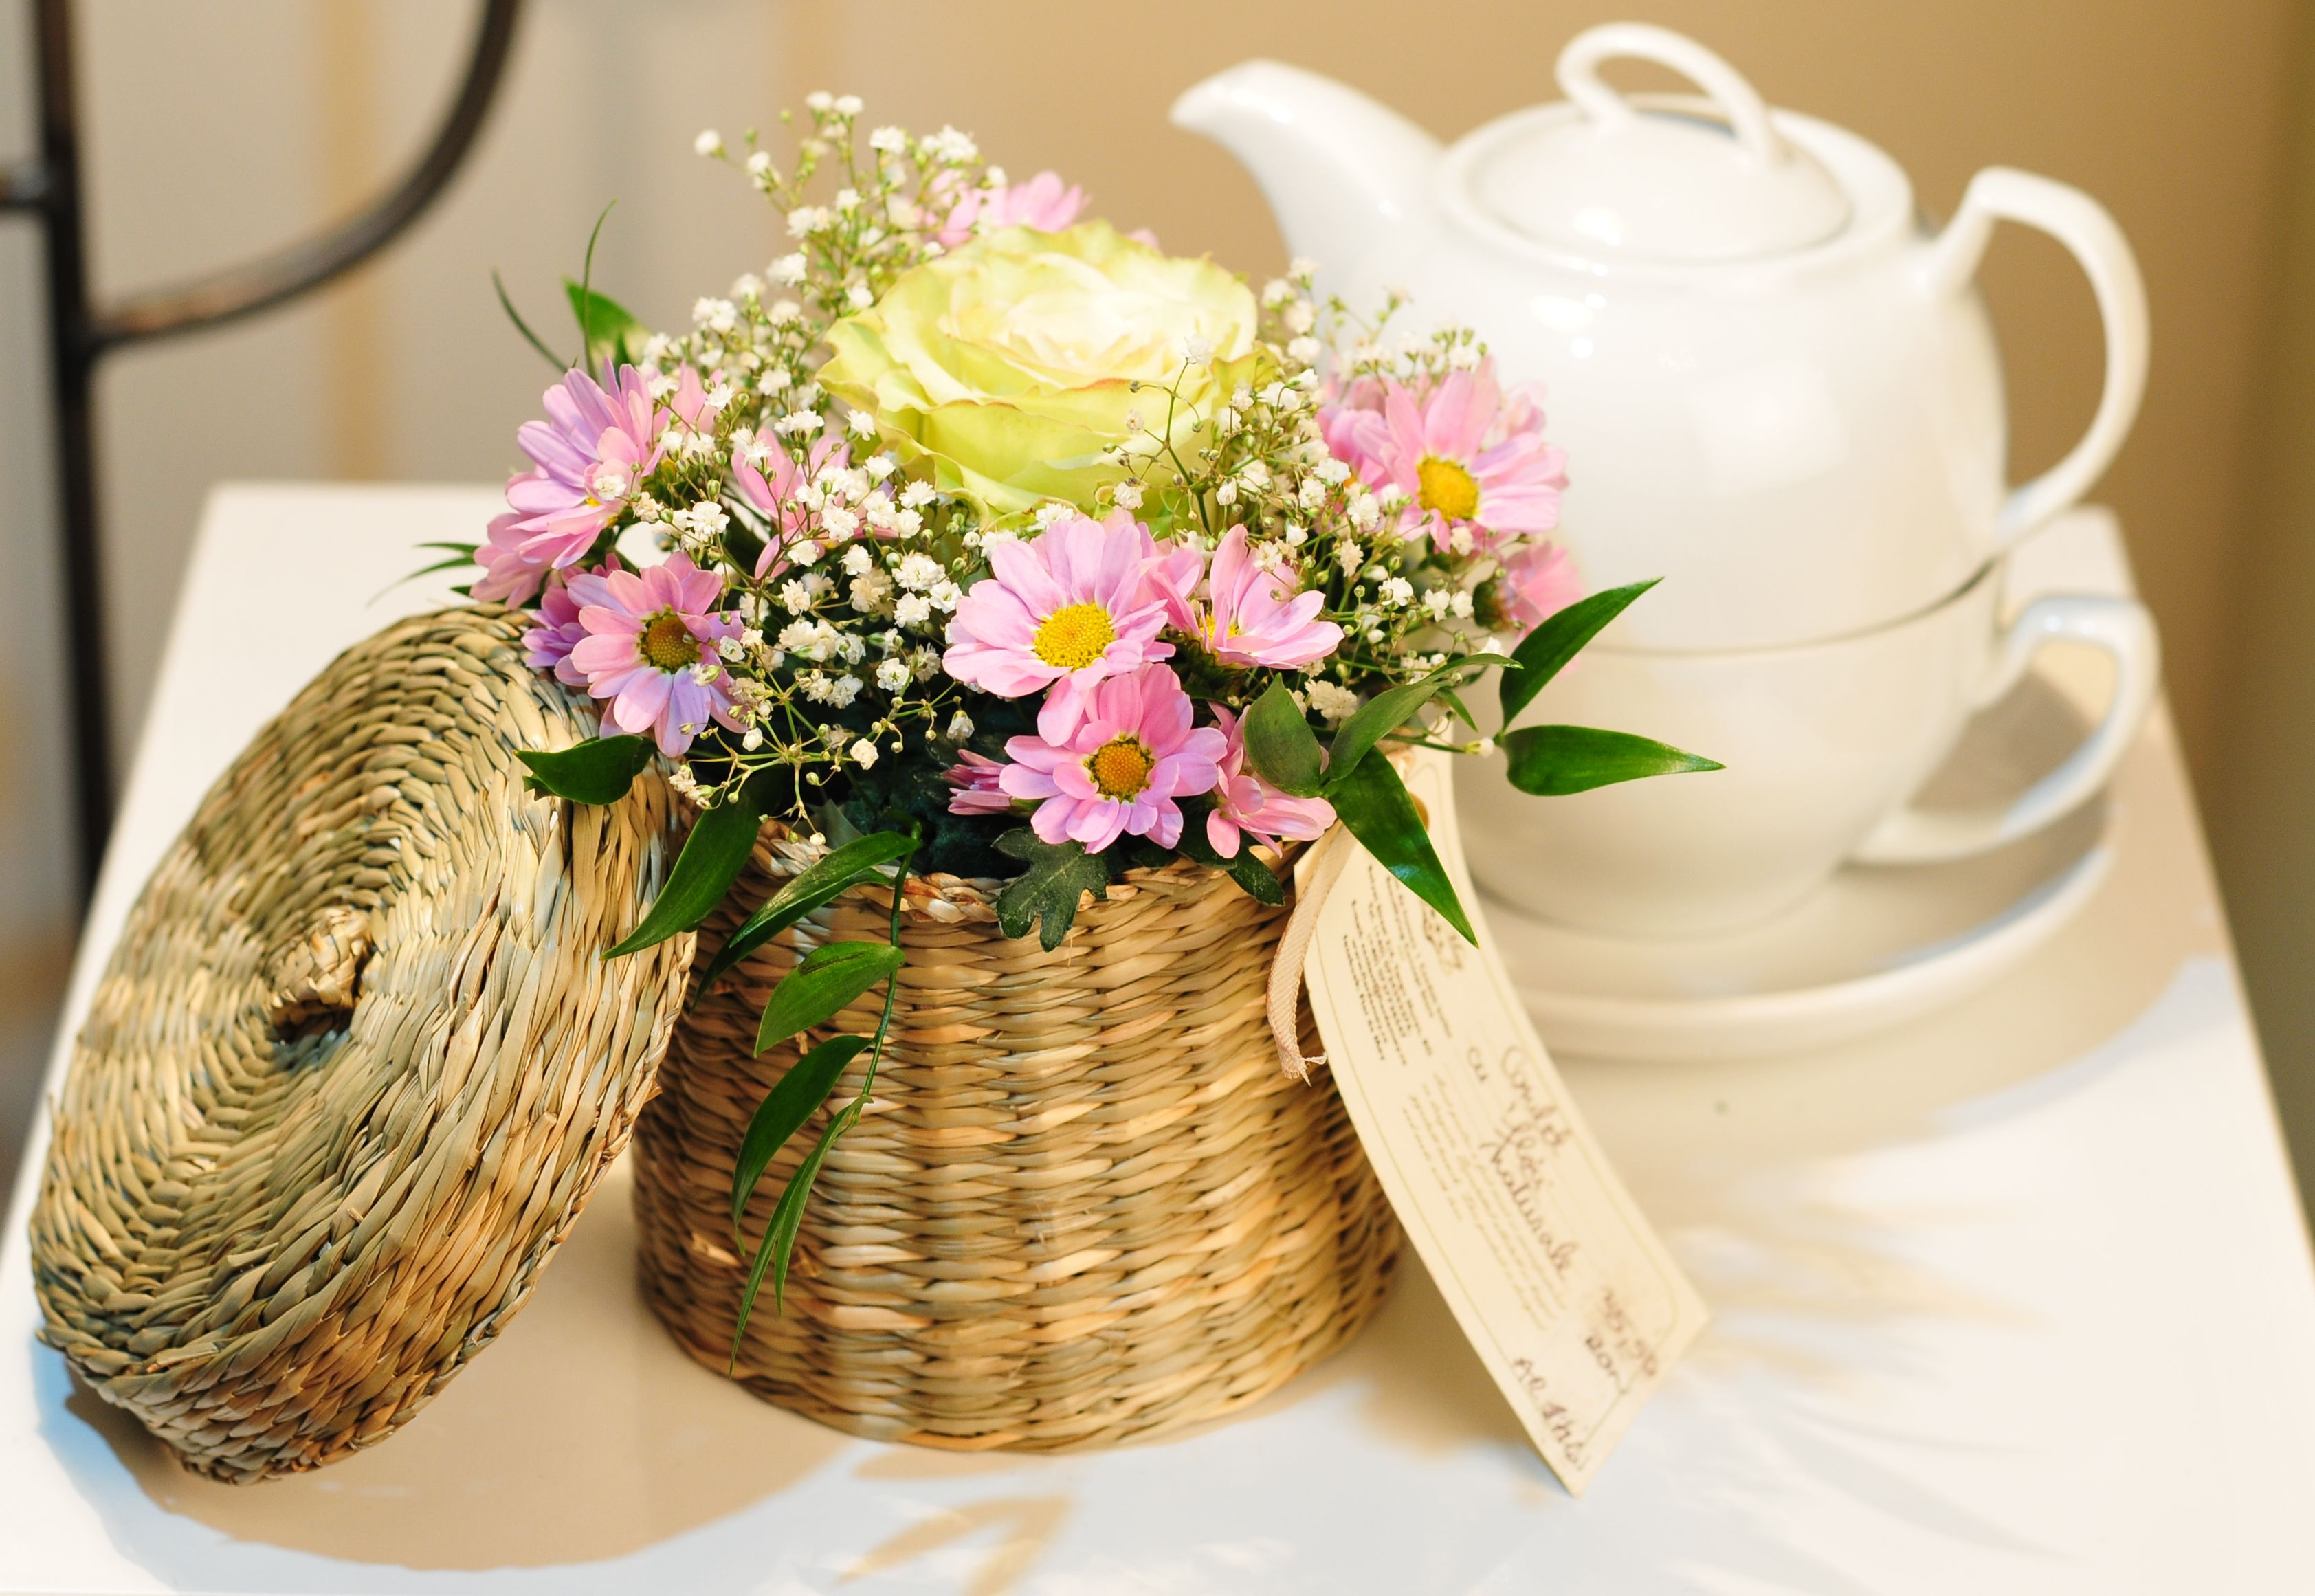 Cosulet cu flori miniaturale margarete trandafiri si floare miresei de la Flor de May